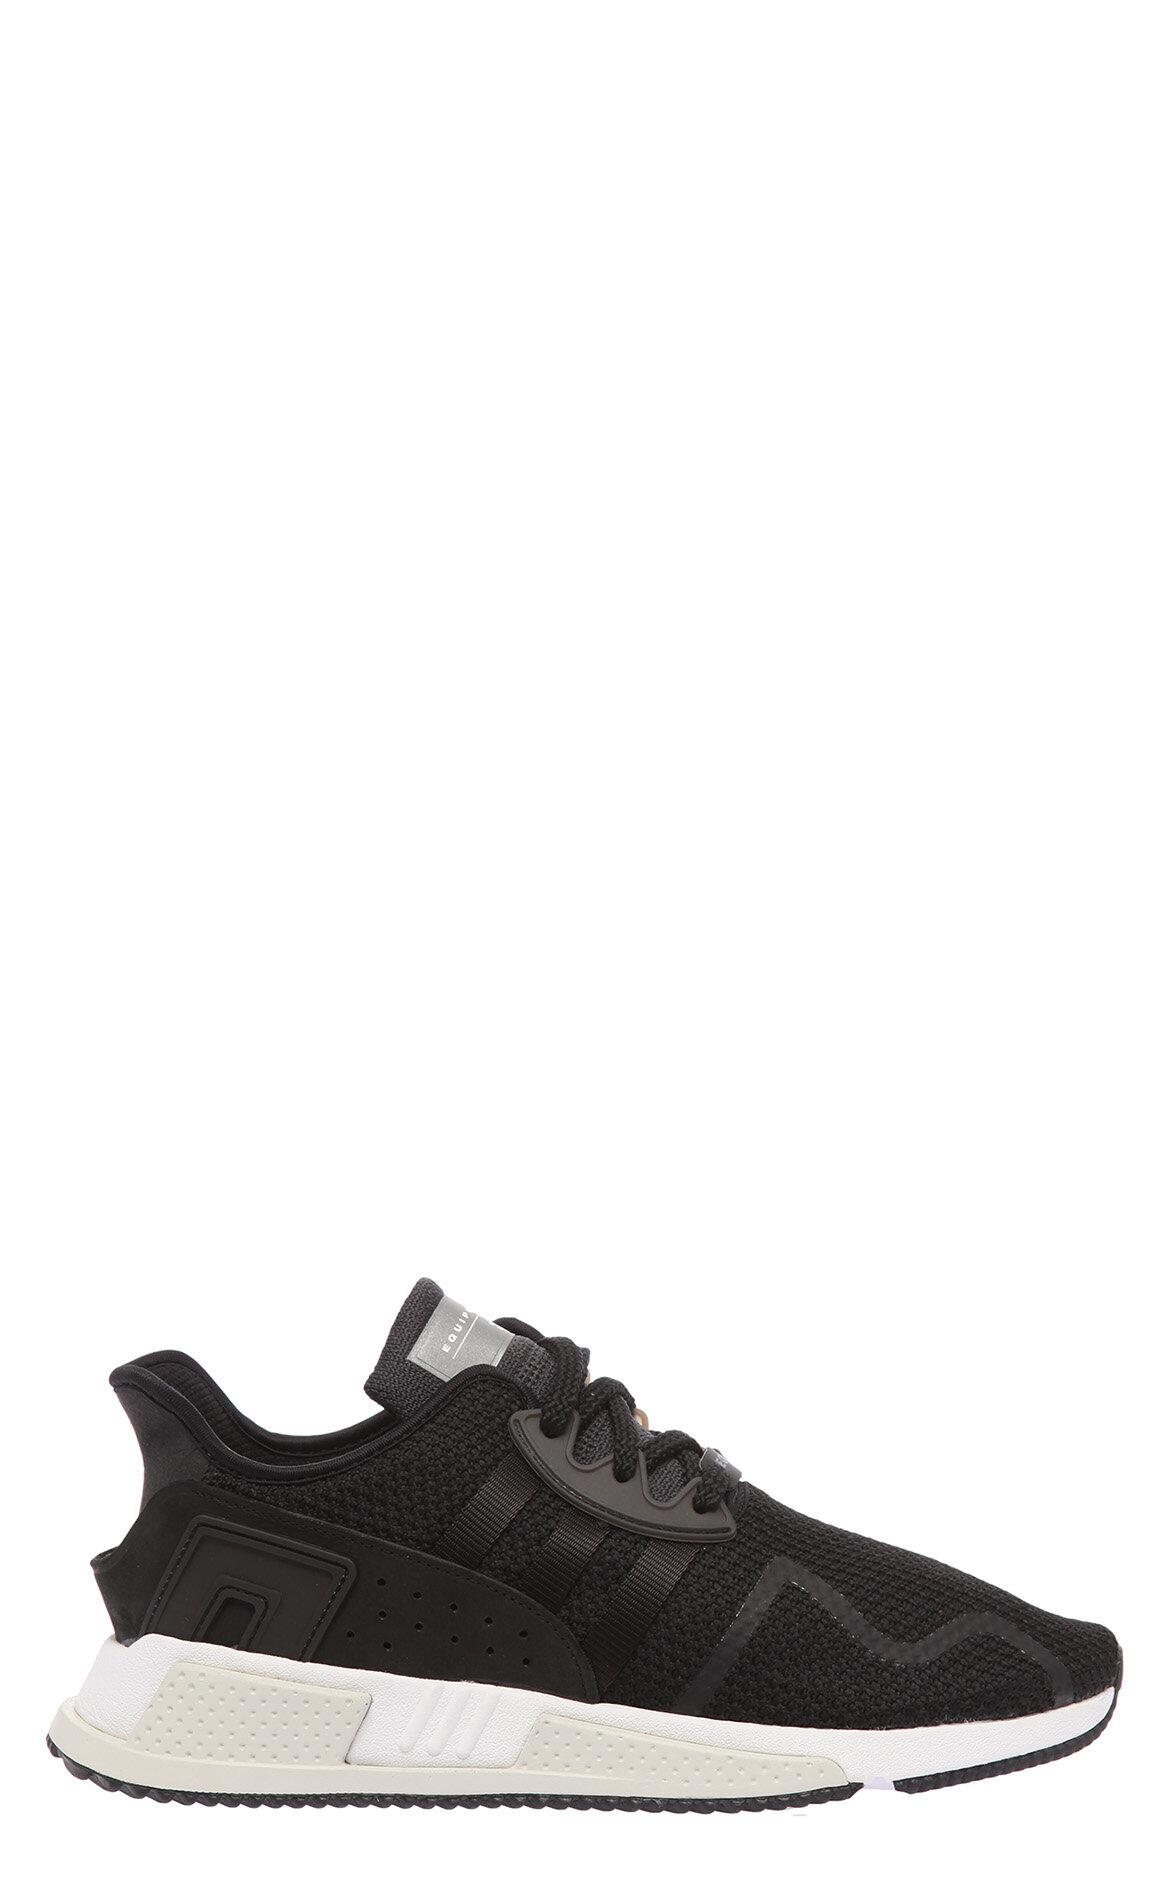 adidas originals EQT Spor Ayakkabı